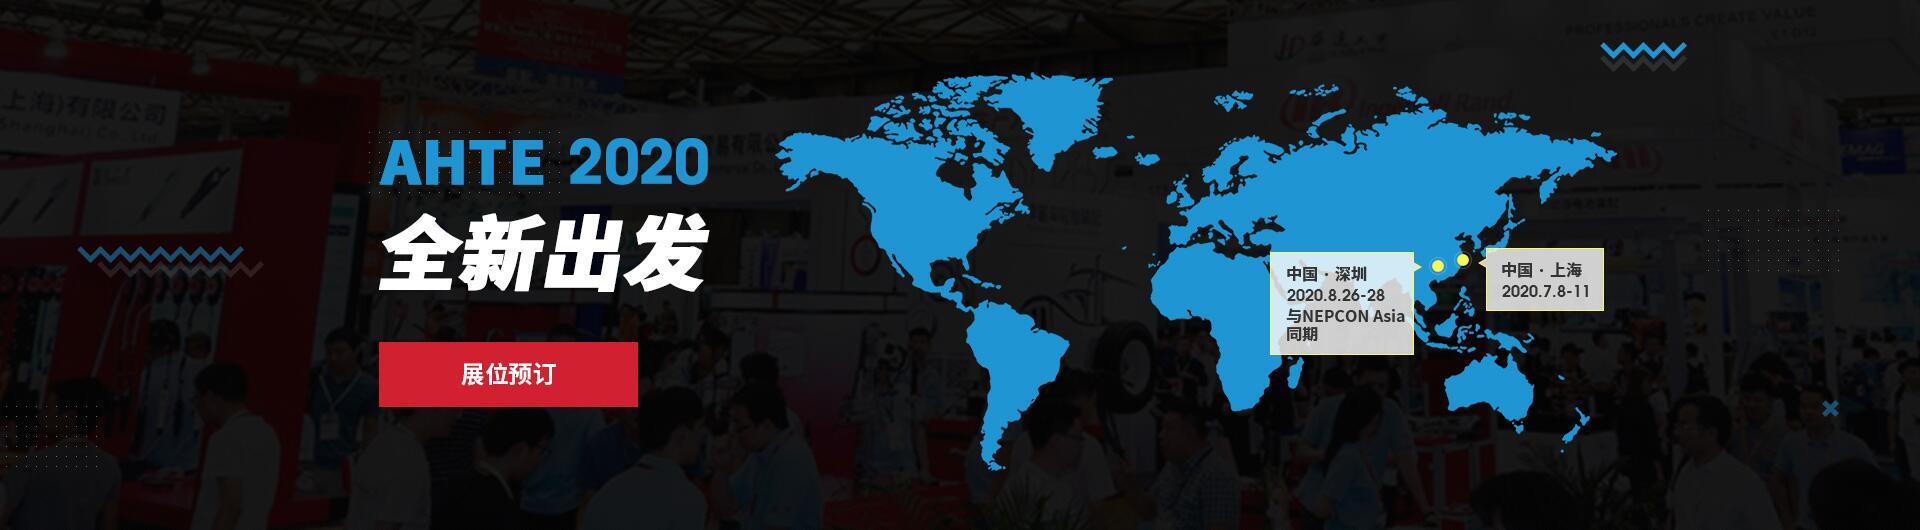 AHTE 2020 全球布局